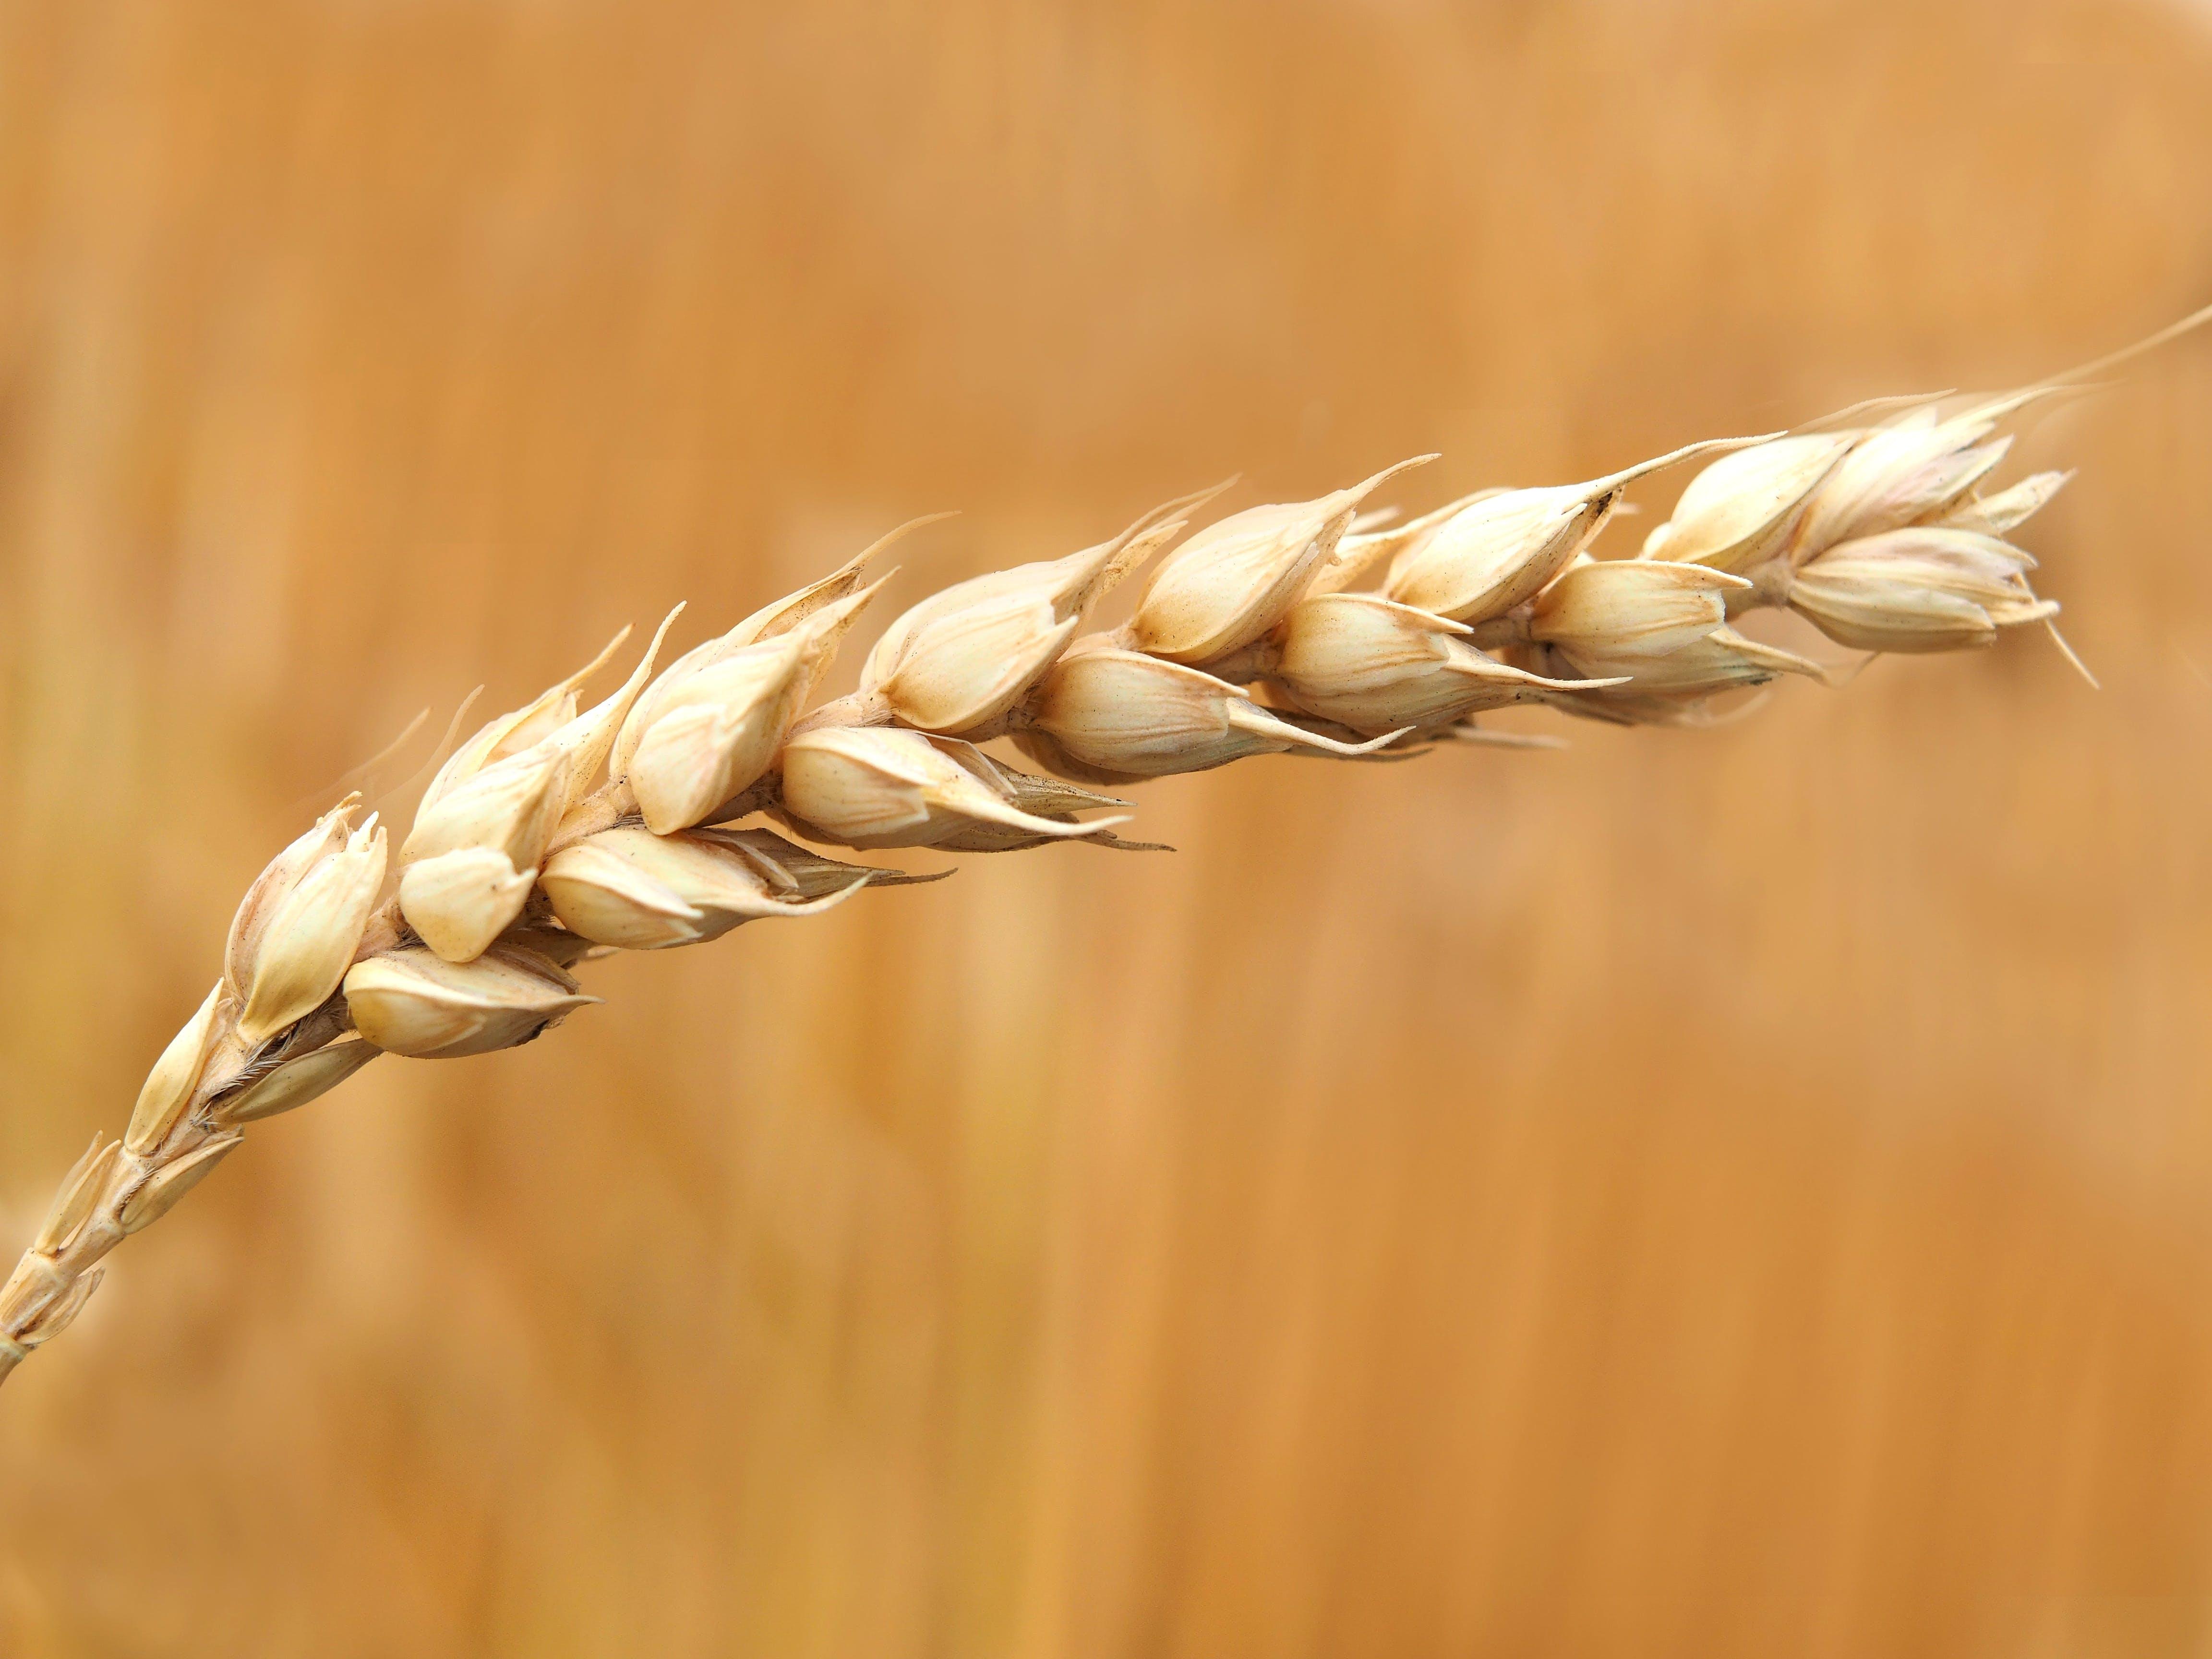 Wheat Grains Closeup Photography